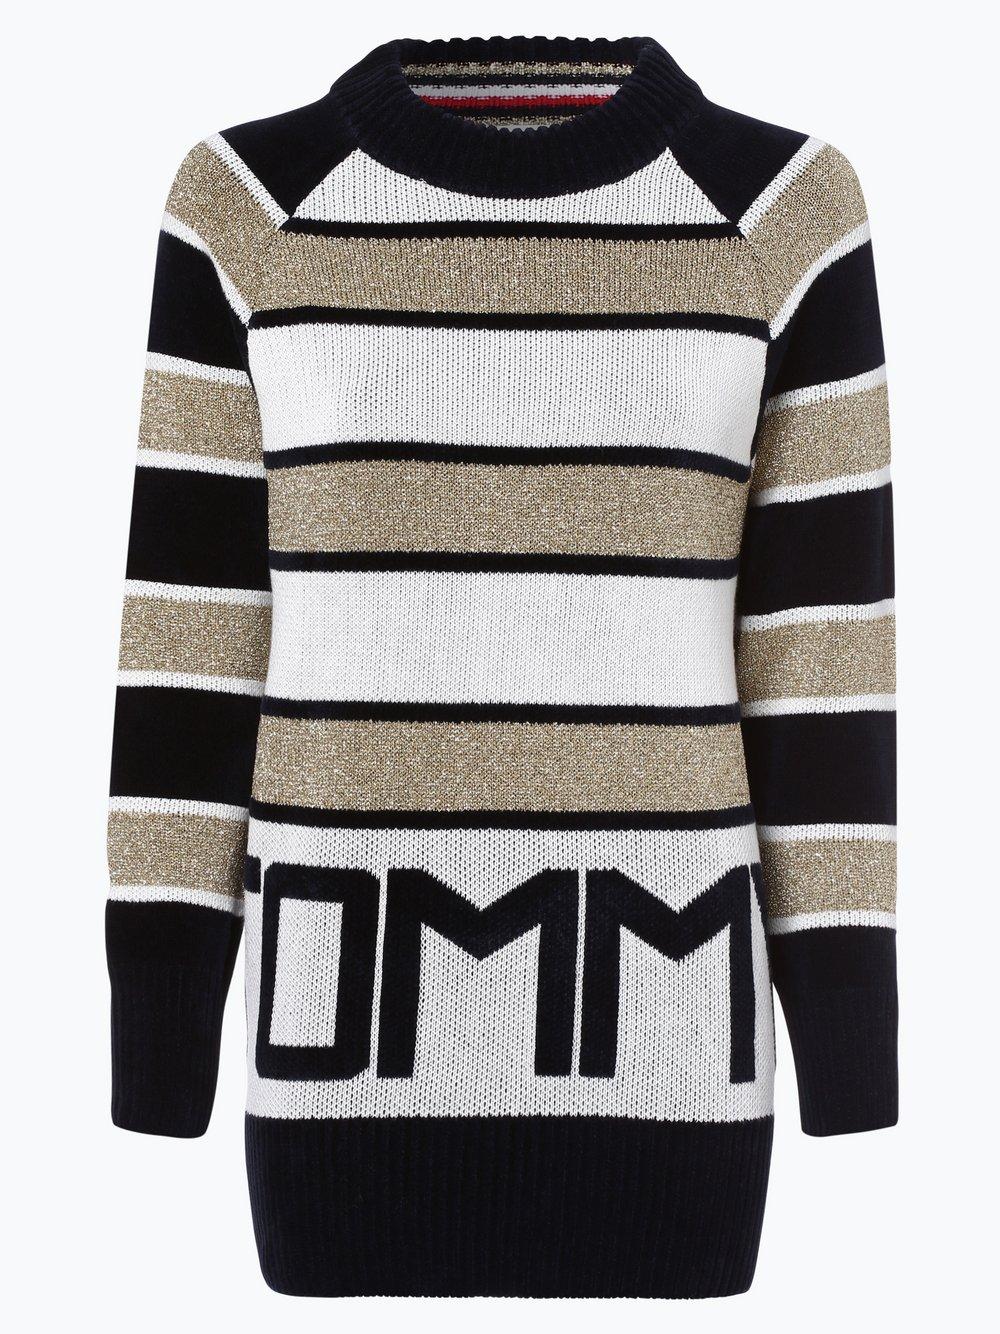 22dddc5dbf Tommy Hilfiger Damen Pullover - Tommy Icons Logo Sweater online ...